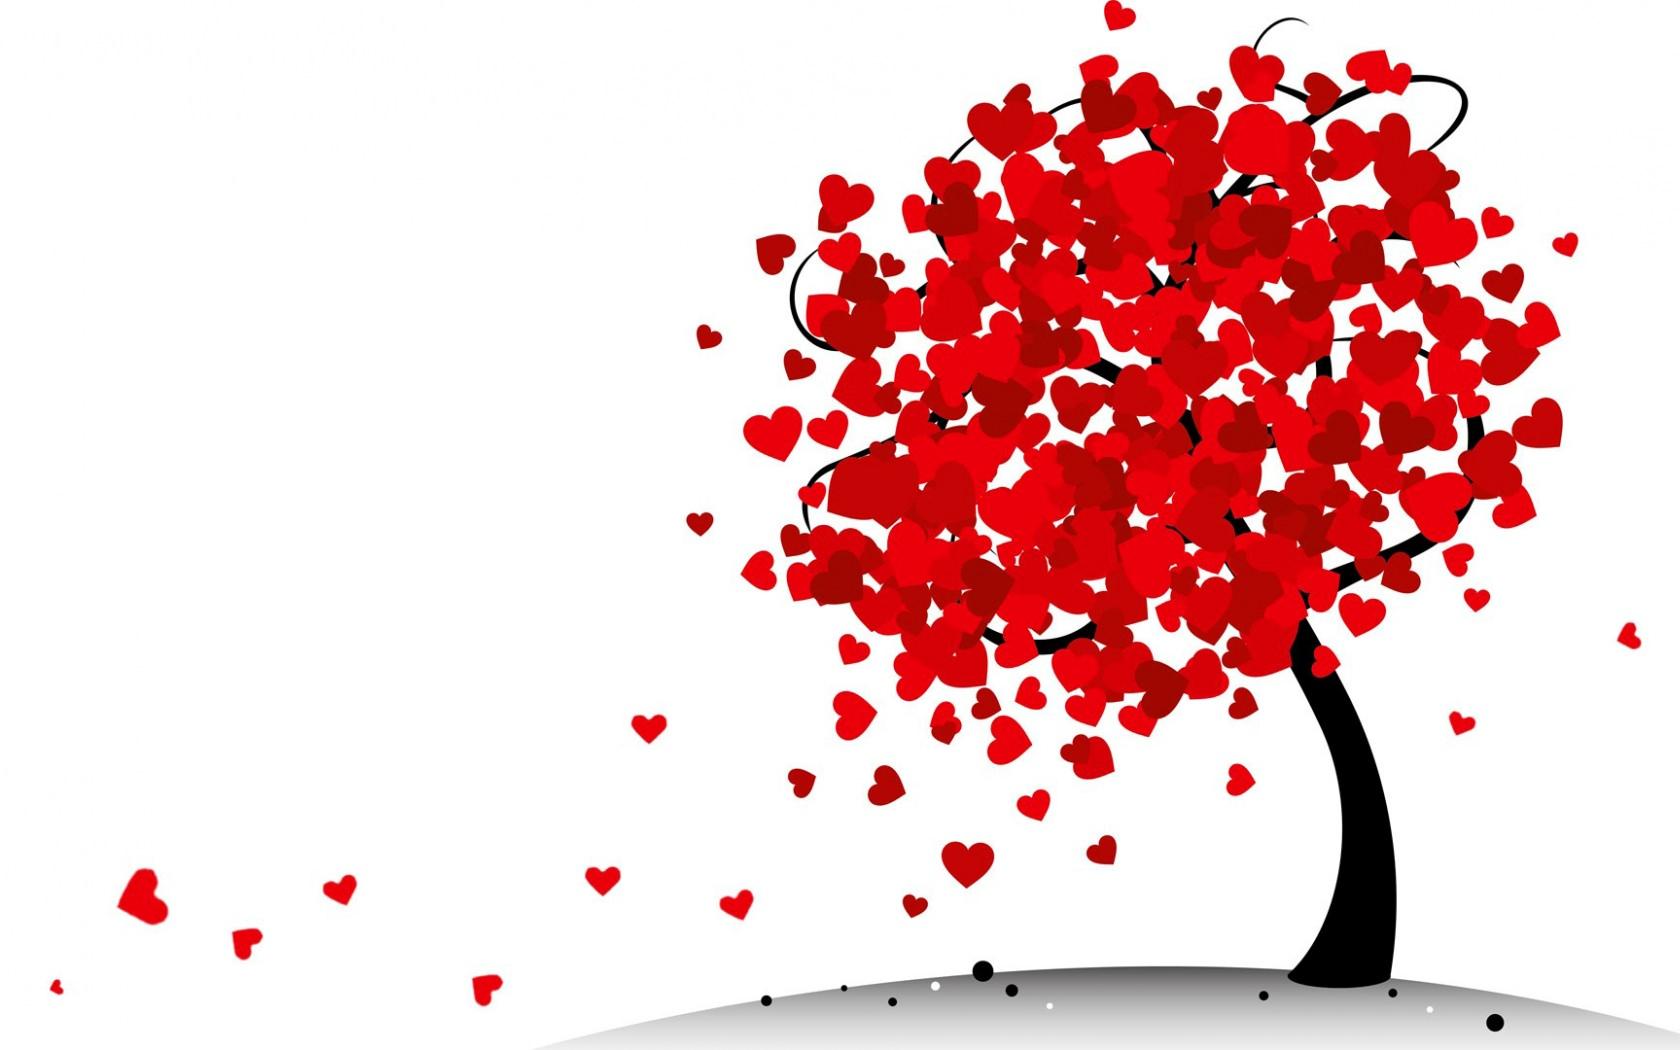 ws_Red_Heart_Tree_1680x1050